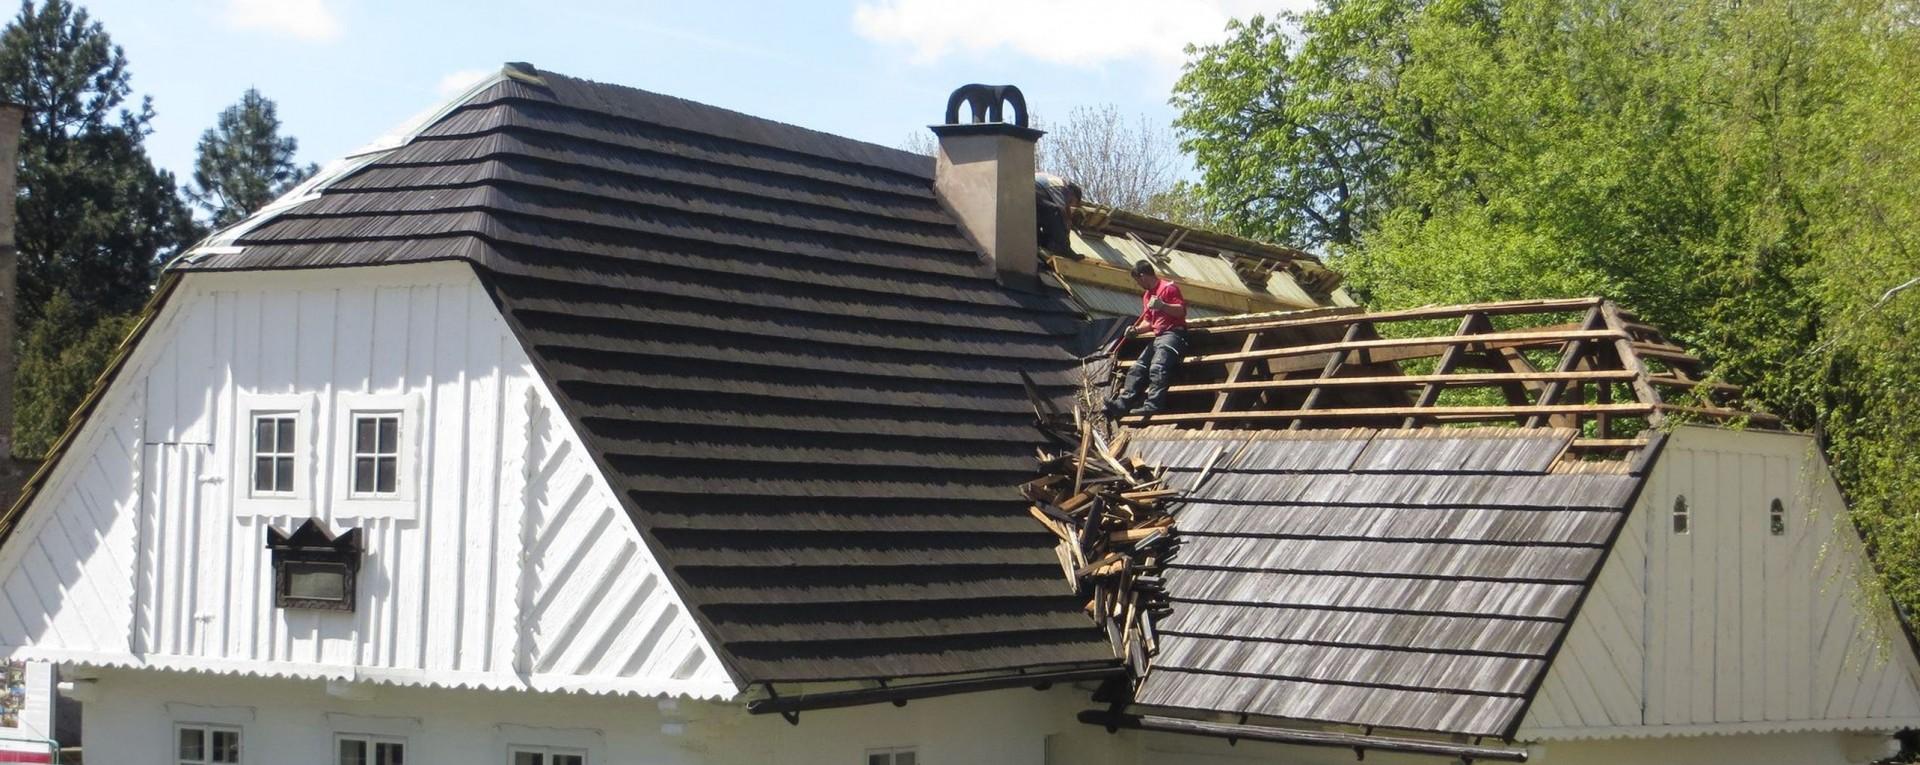 roof repair near Forney